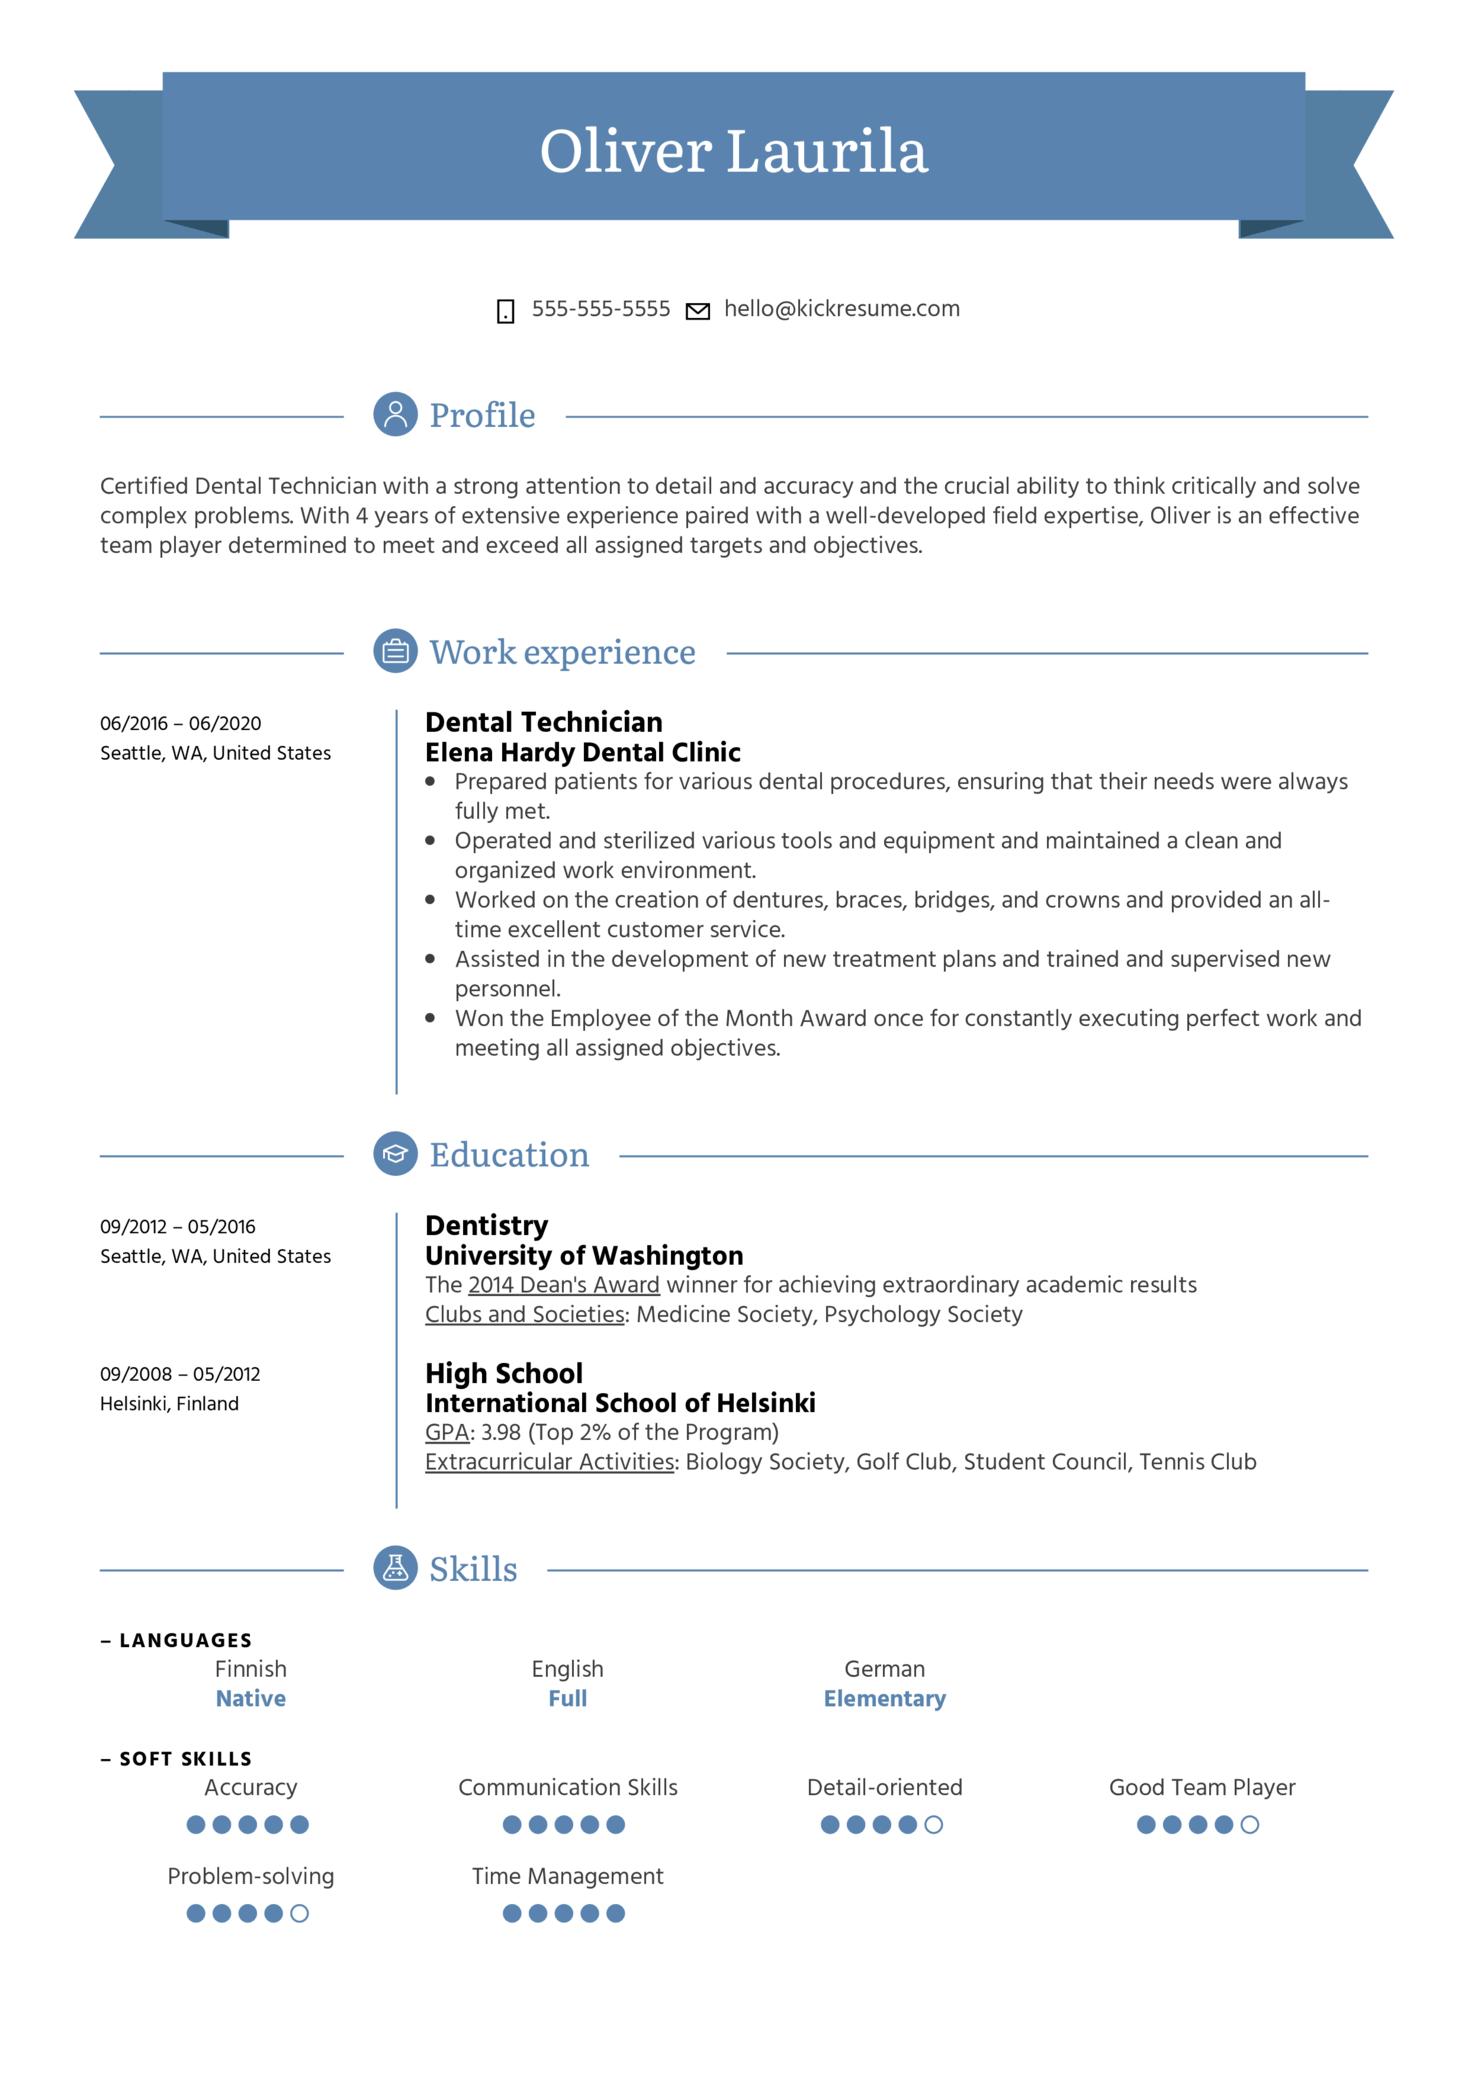 Dental Technician Resume Example (Parte 1)